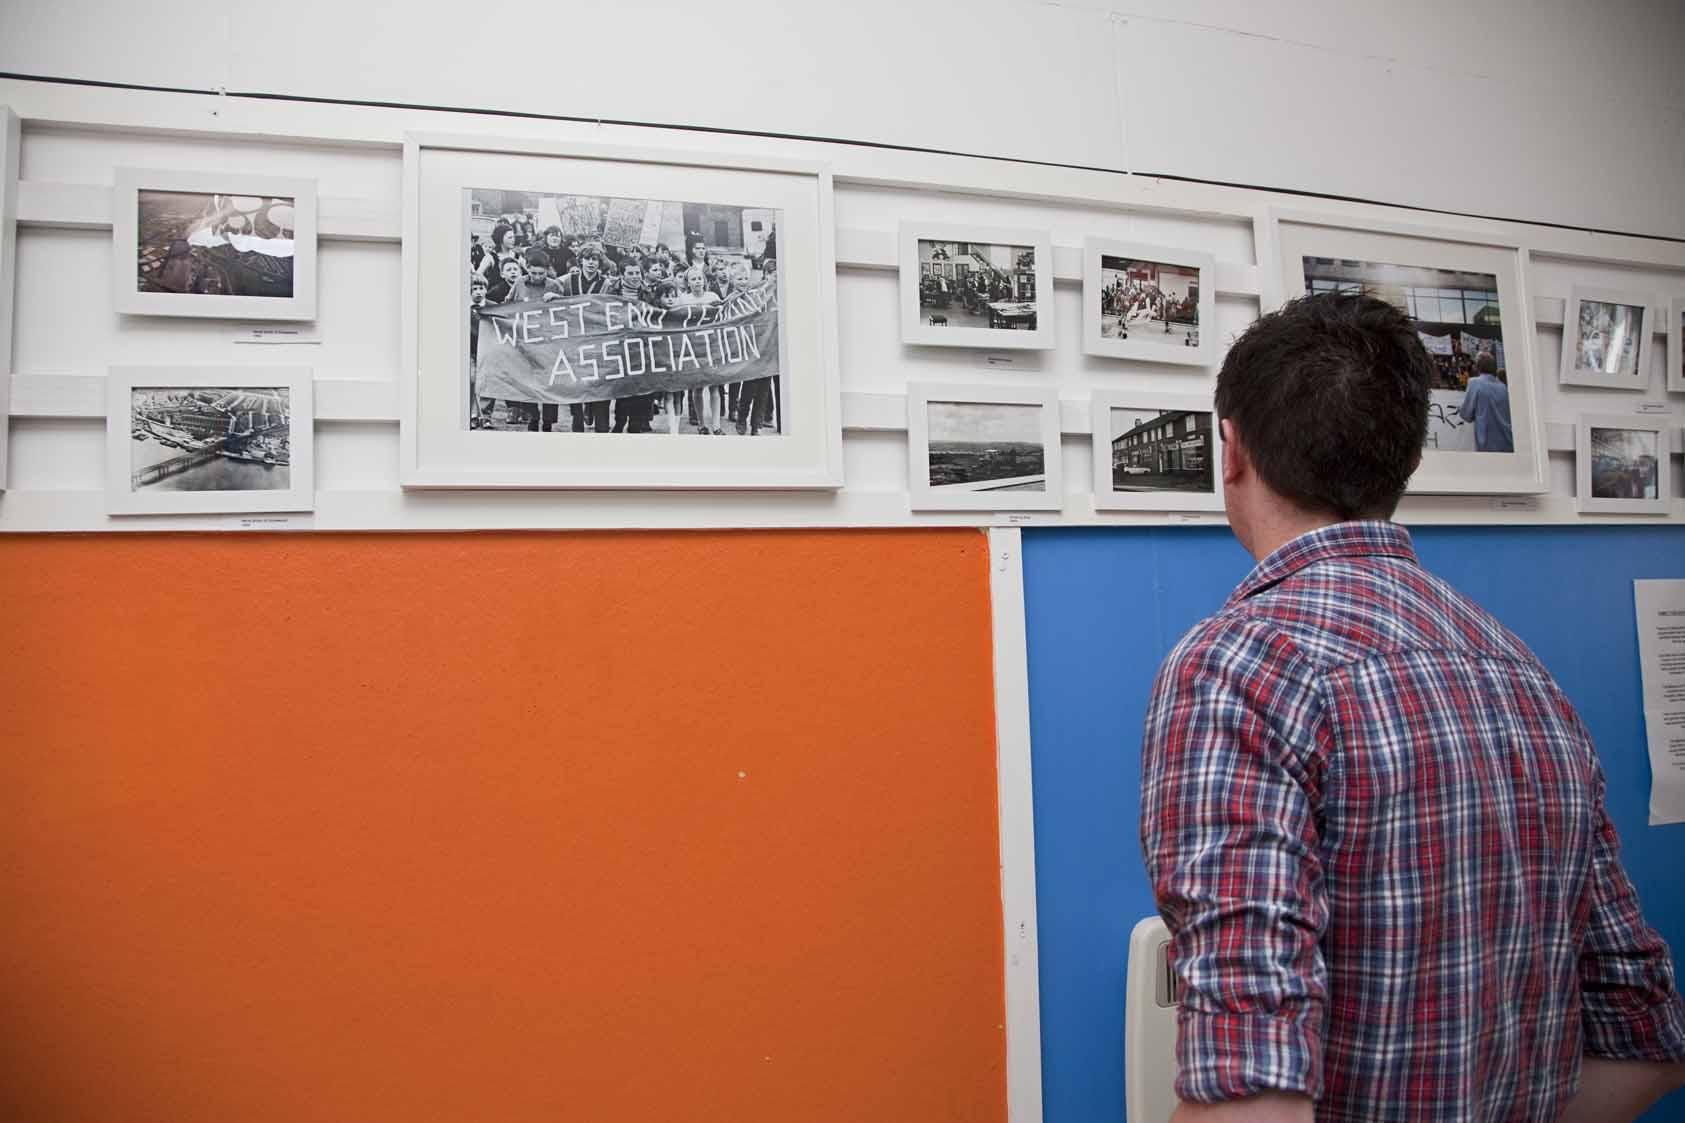 Offsite Exhibition